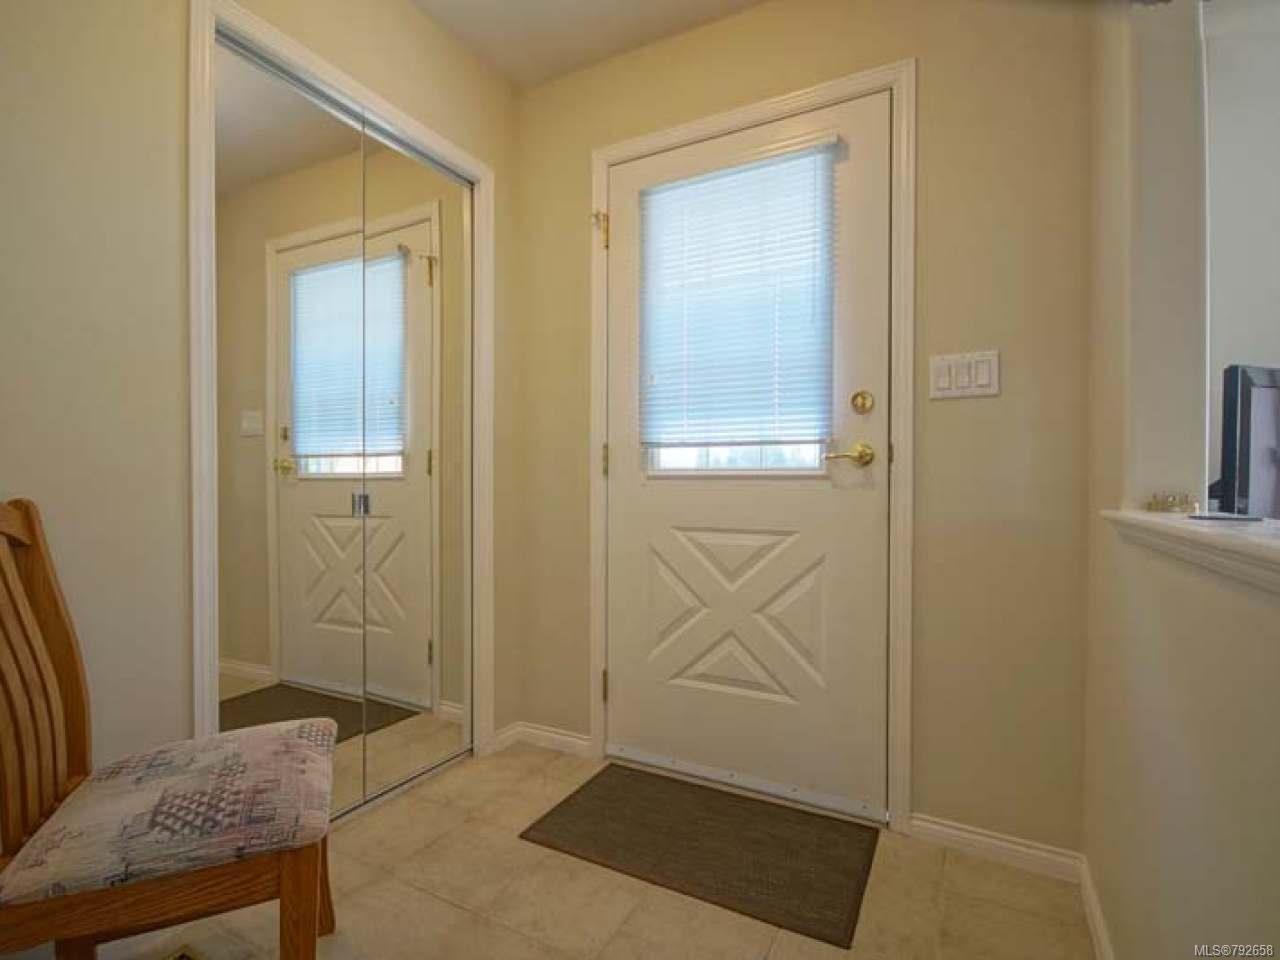 Photo 12: Photos: 893 EDGEWARE Avenue in PARKSVILLE: PQ Parksville House for sale (Parksville/Qualicum)  : MLS®# 792658